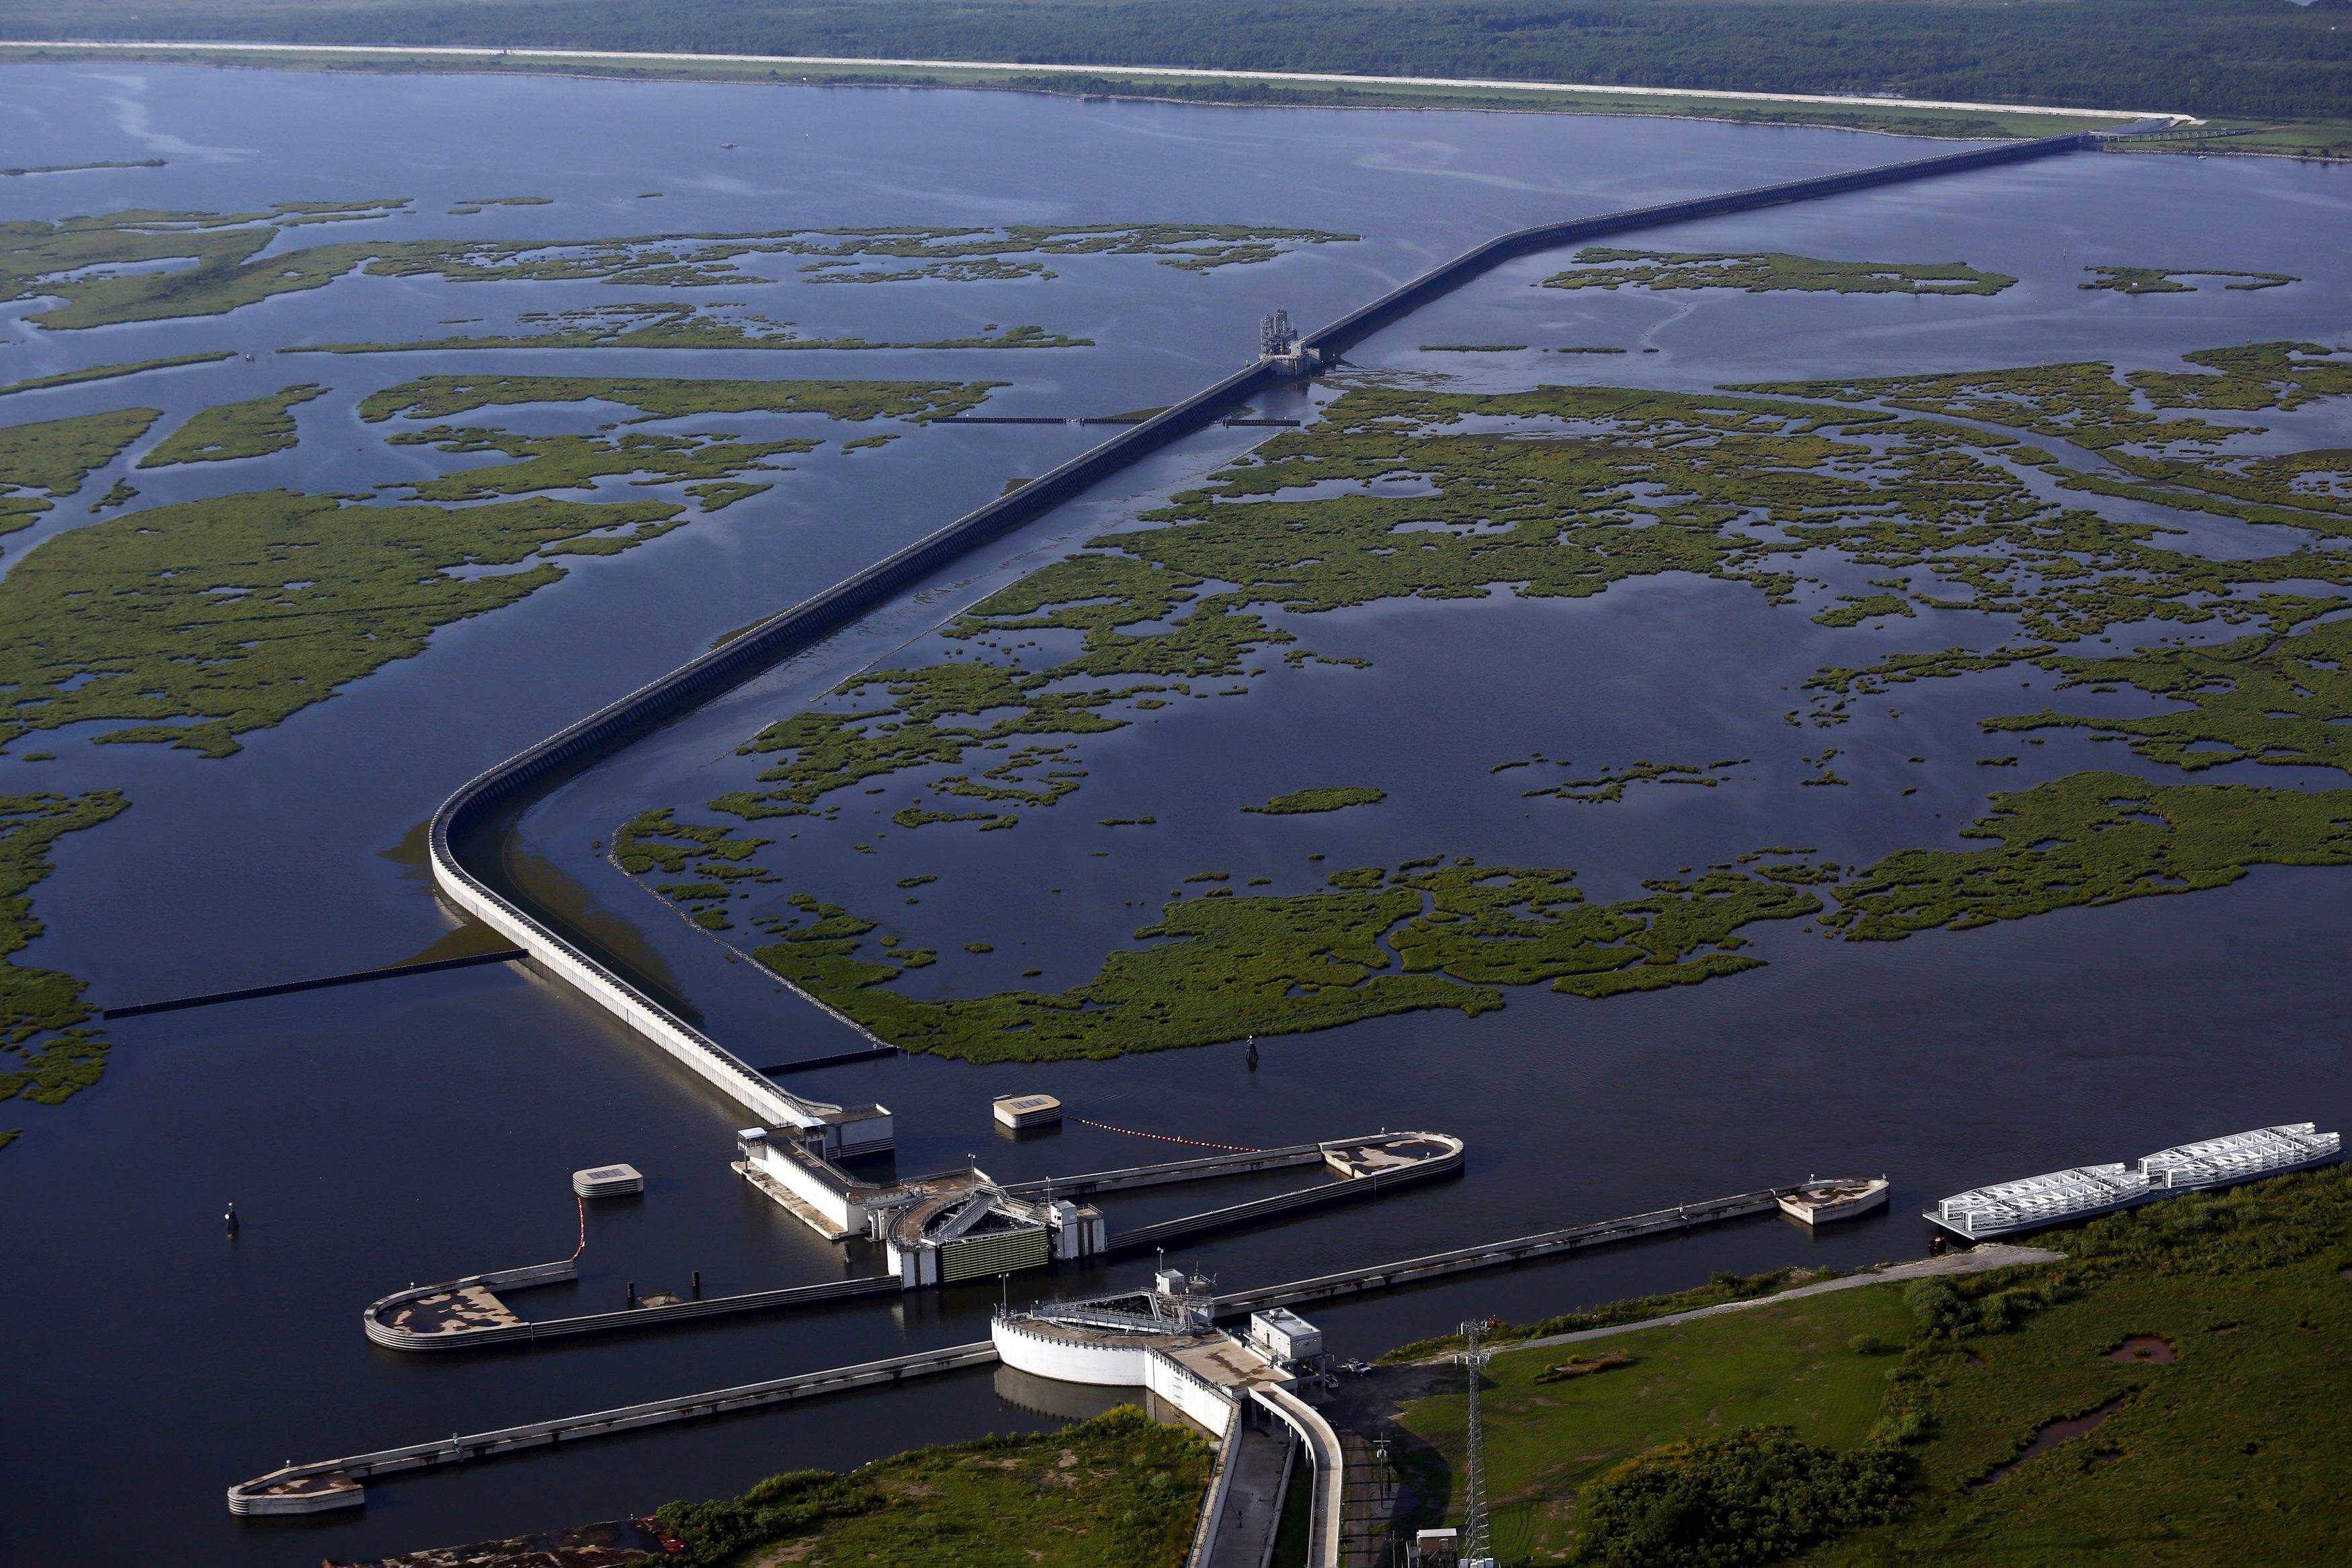 Zonas Afectadas Por El Huracan Katrina 10 Anos Despues Vistazo